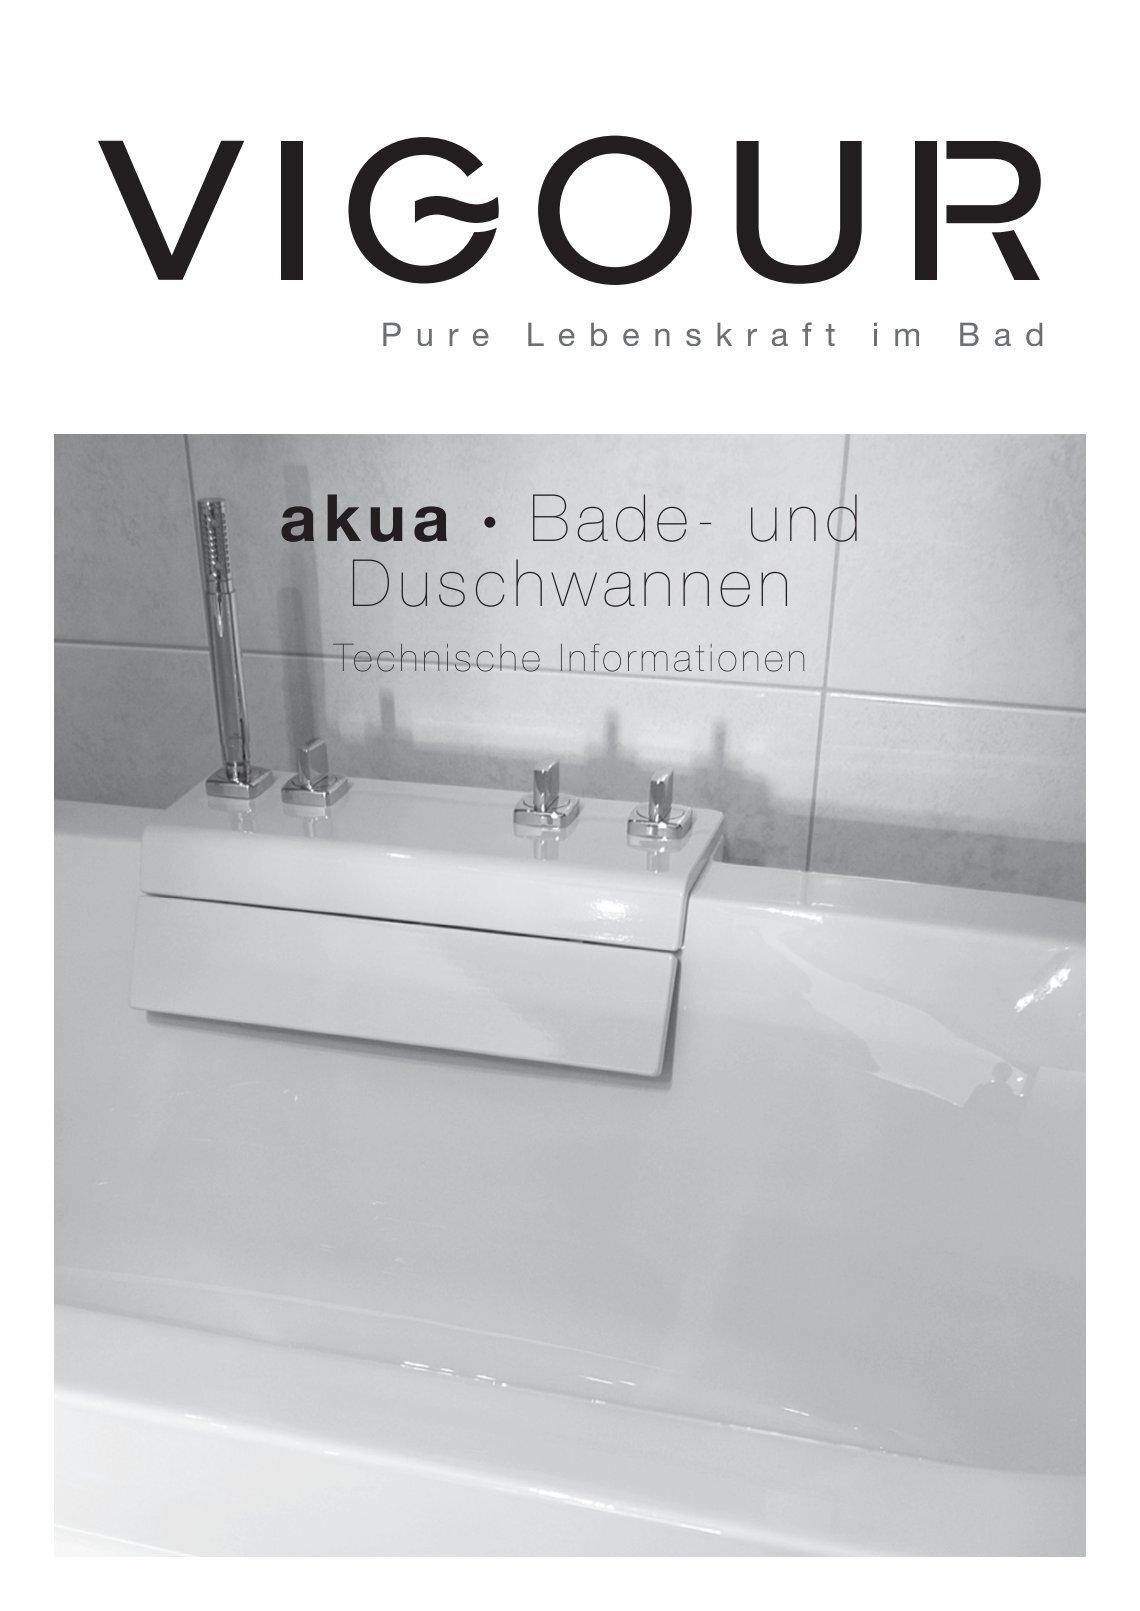 clivia waschtisch excellent waschtisch akua xcm weiss vigour with clivia waschtisch cheap. Black Bedroom Furniture Sets. Home Design Ideas